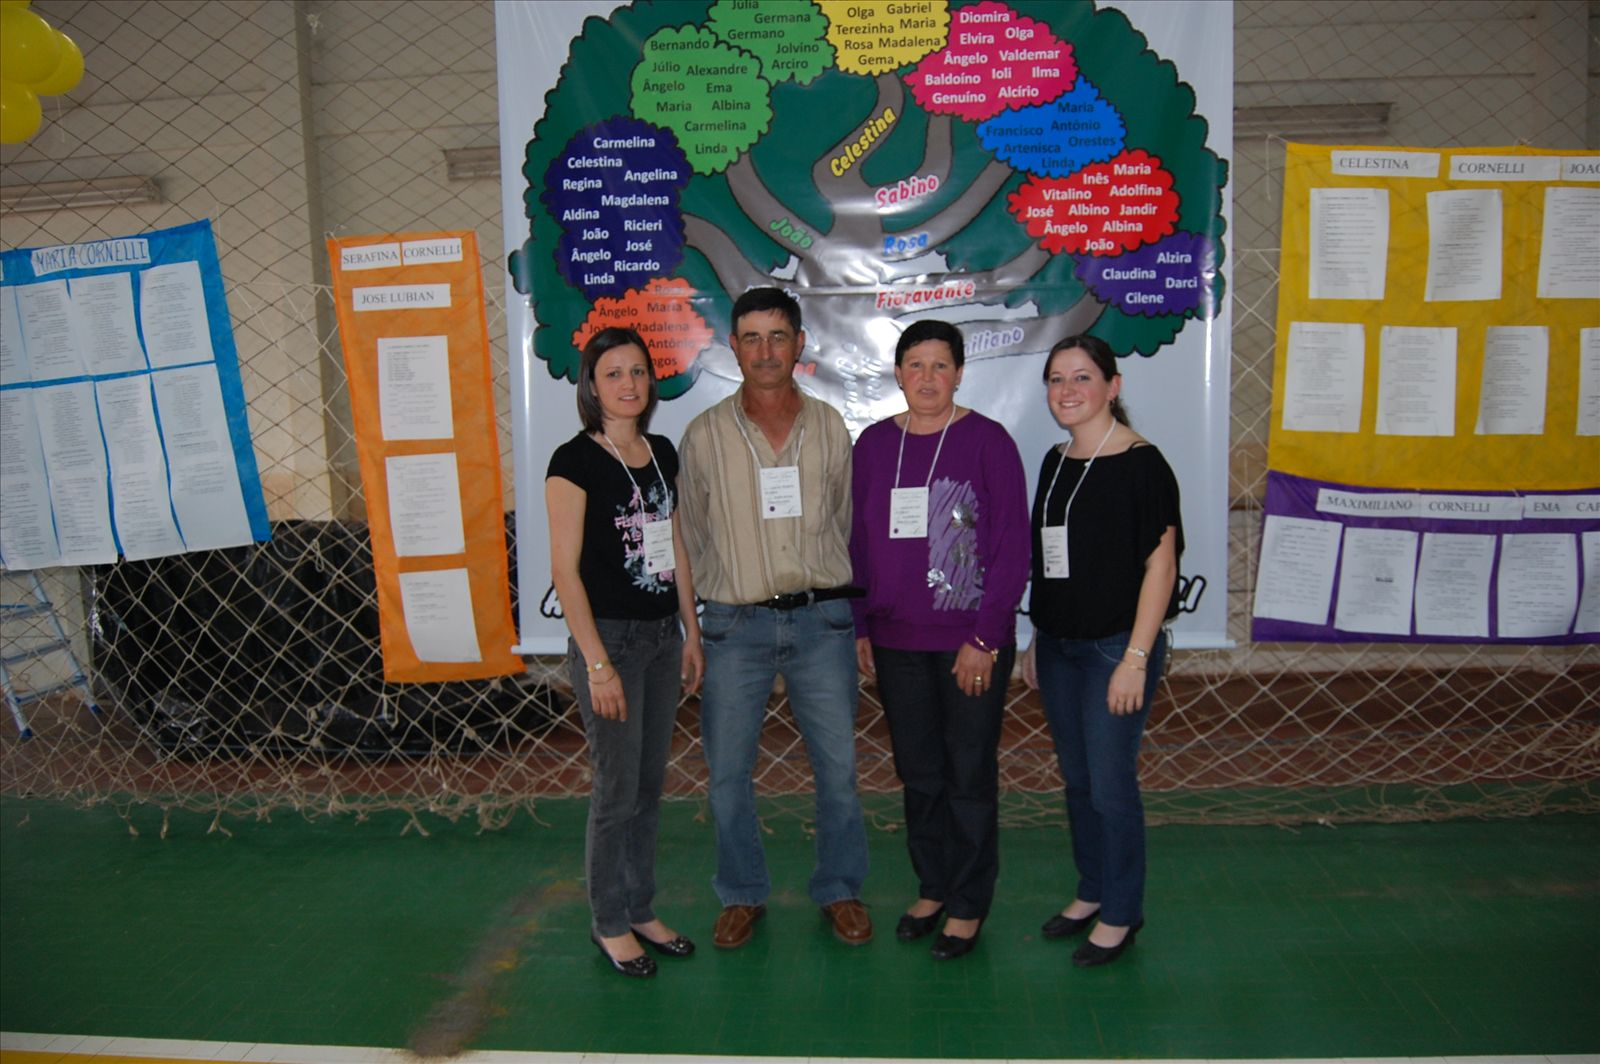 2º Encontro Família Cornelli - 11.10.2009 (221)_0